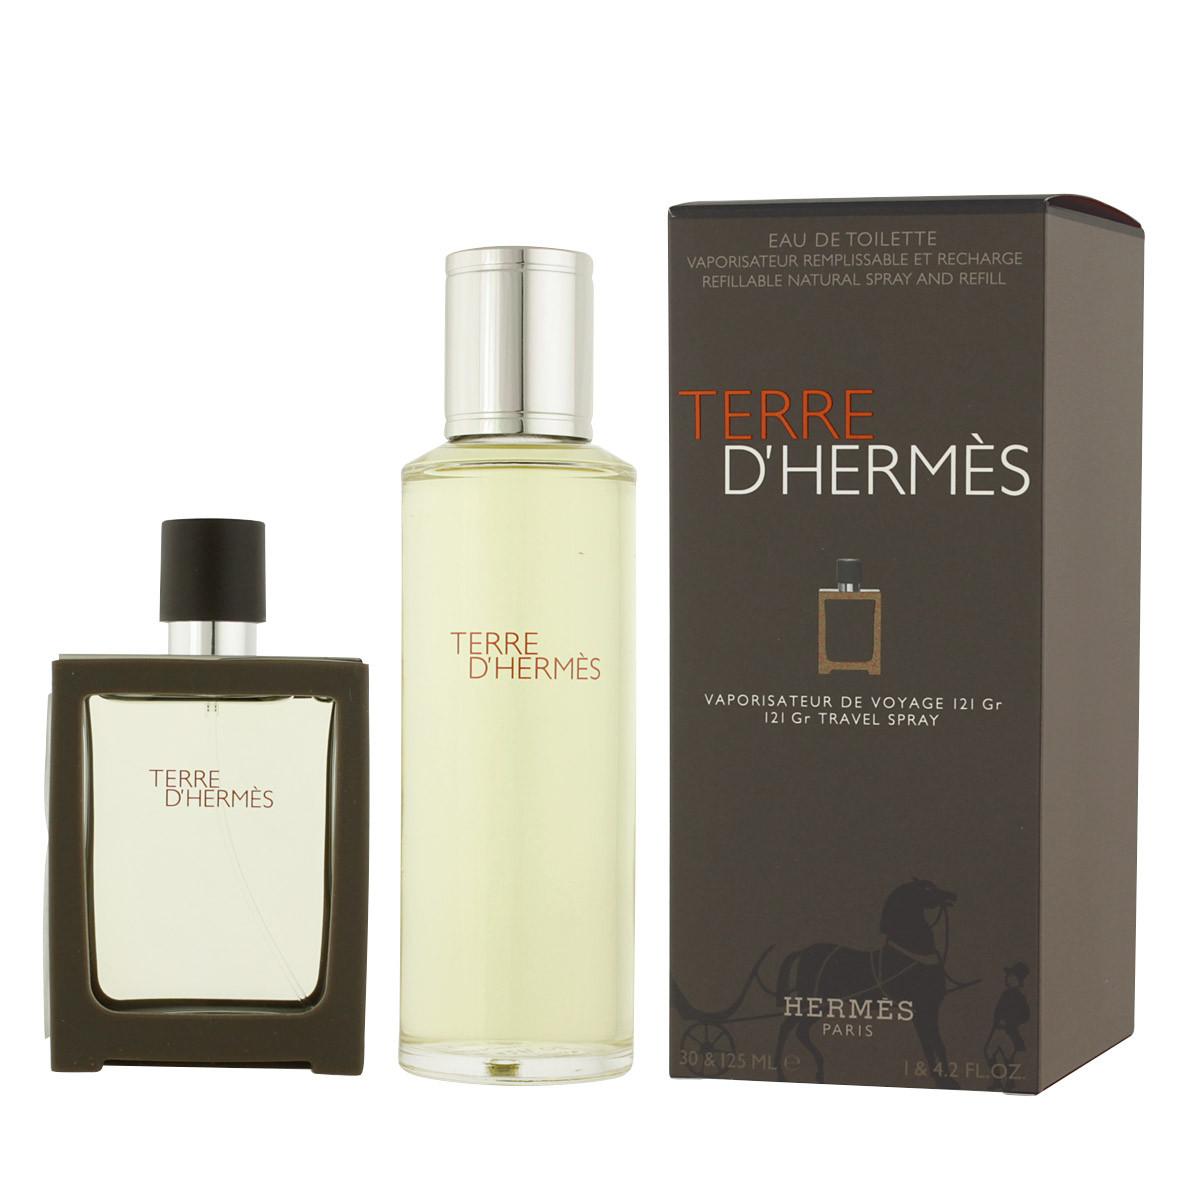 Hermès Terre Dhermès Edt 30 Ml Edt Mini Nachfüllung 125 Ml Man